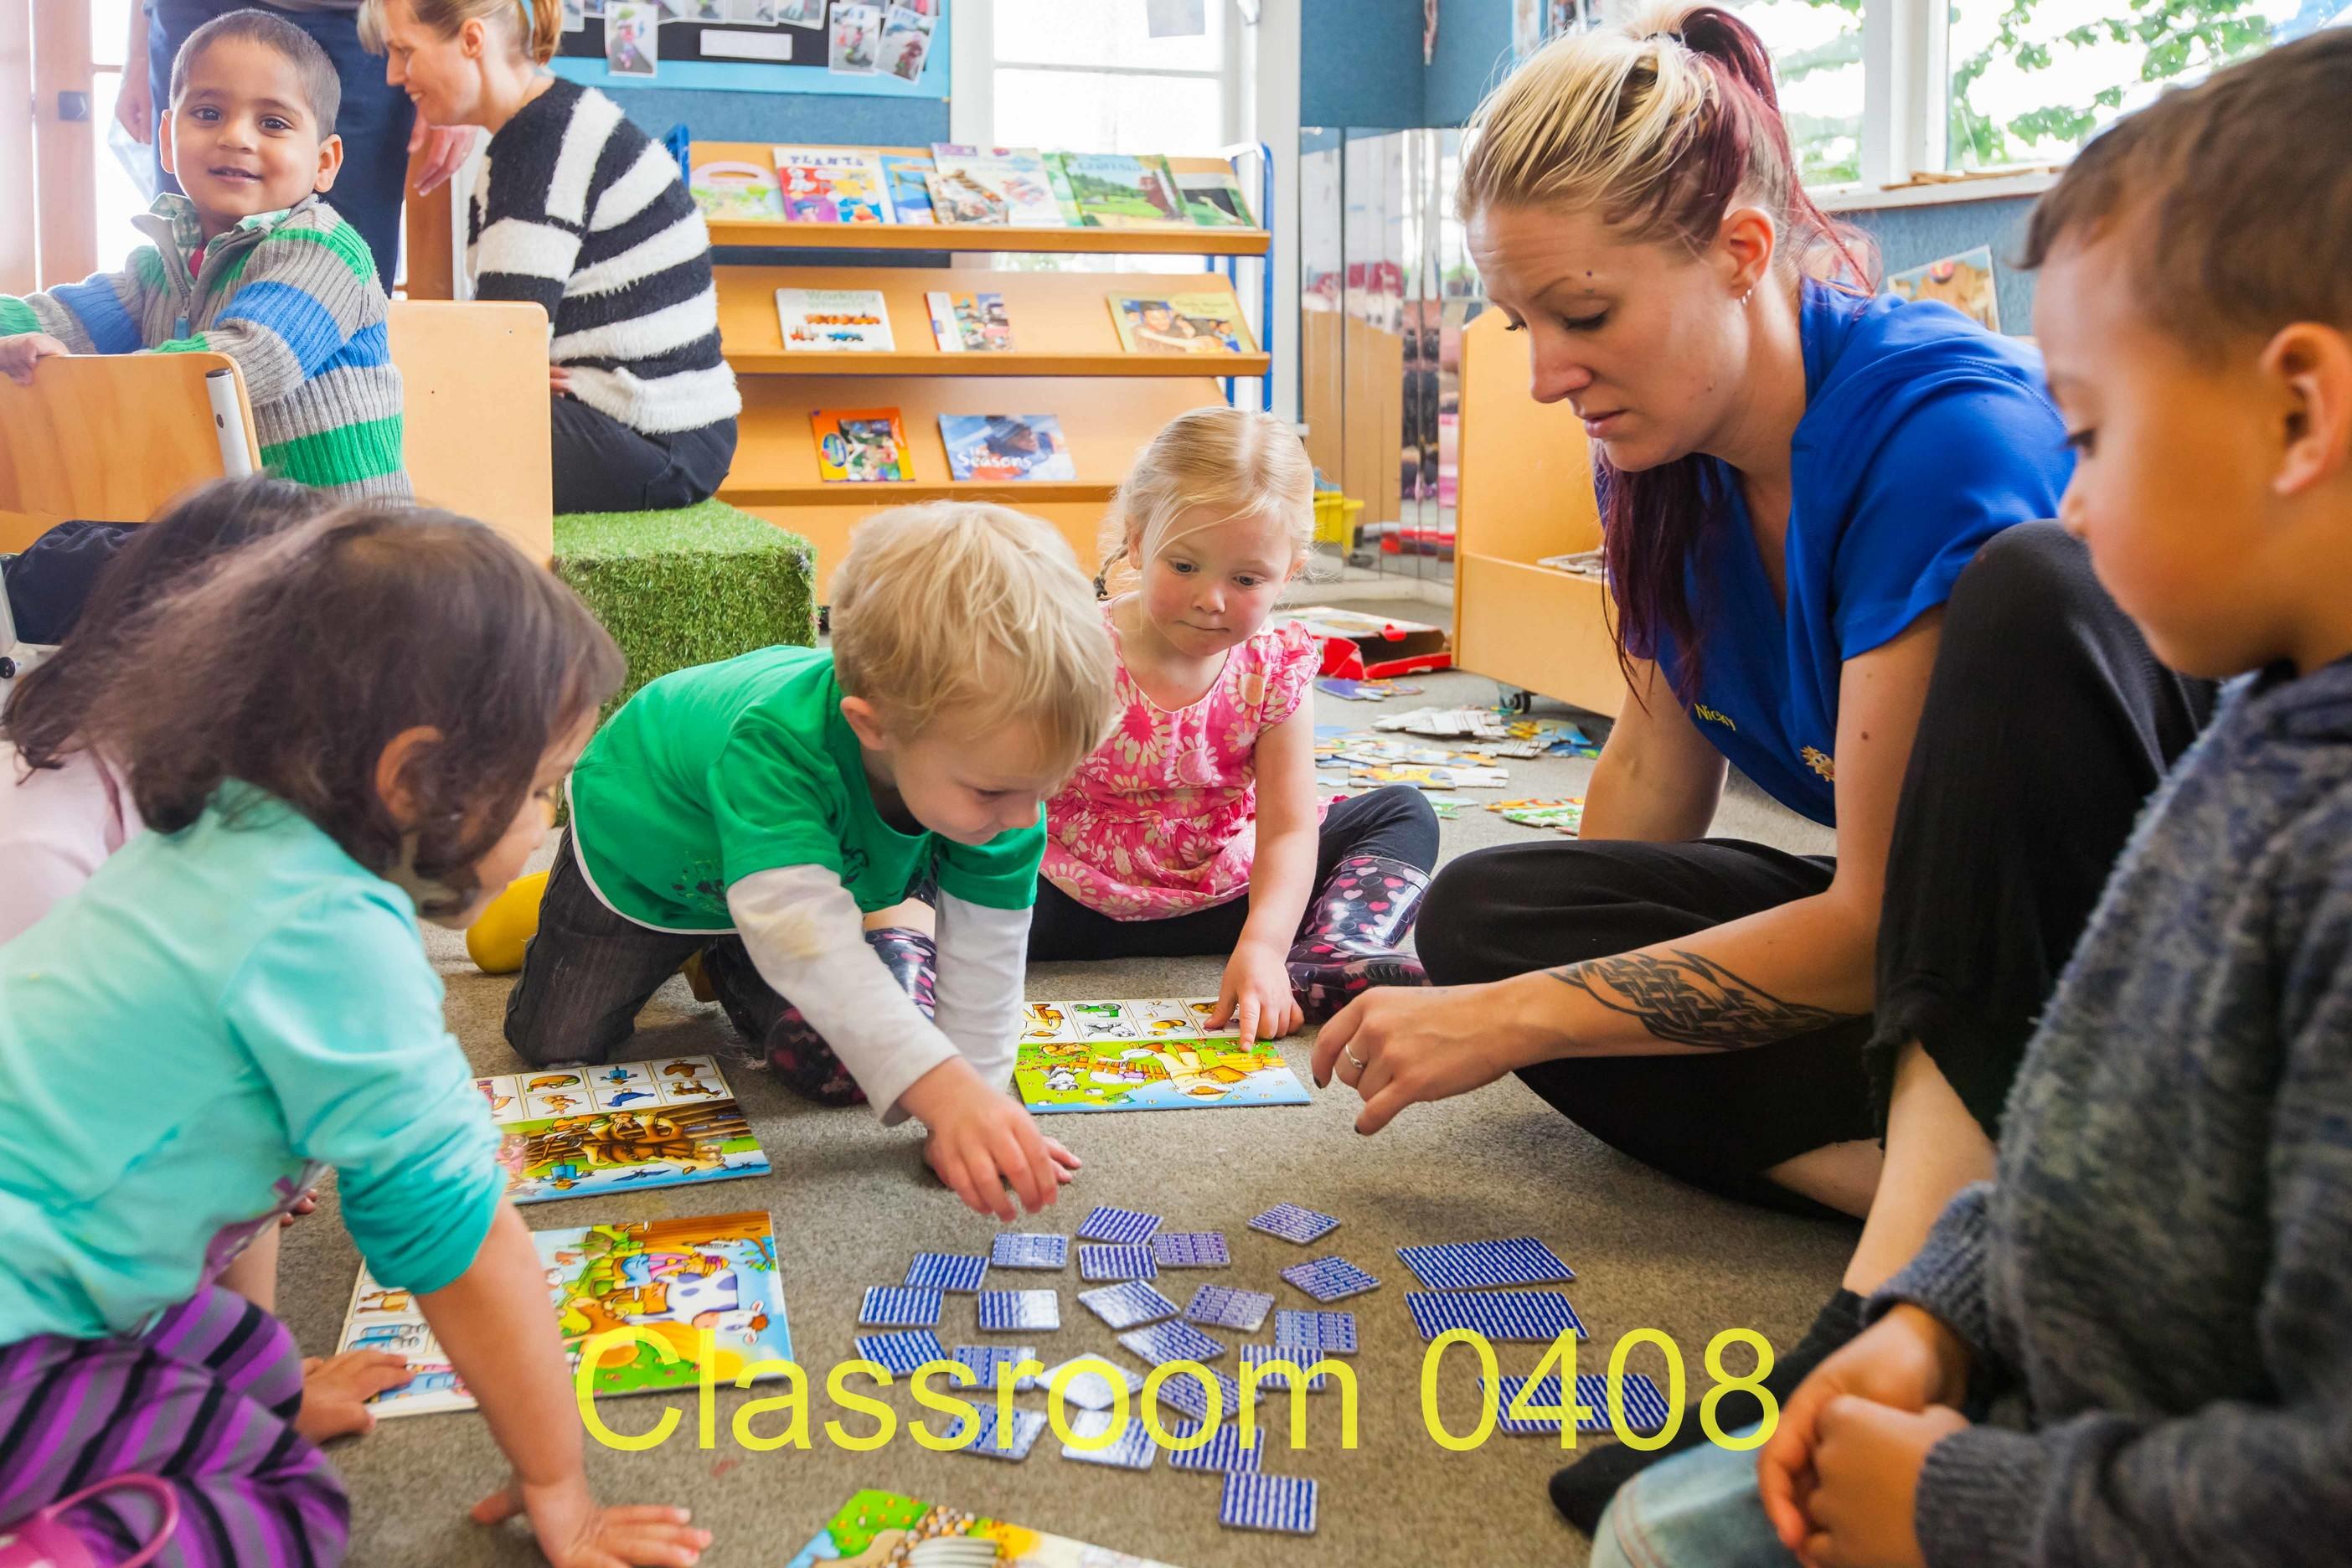 Classroom 0408